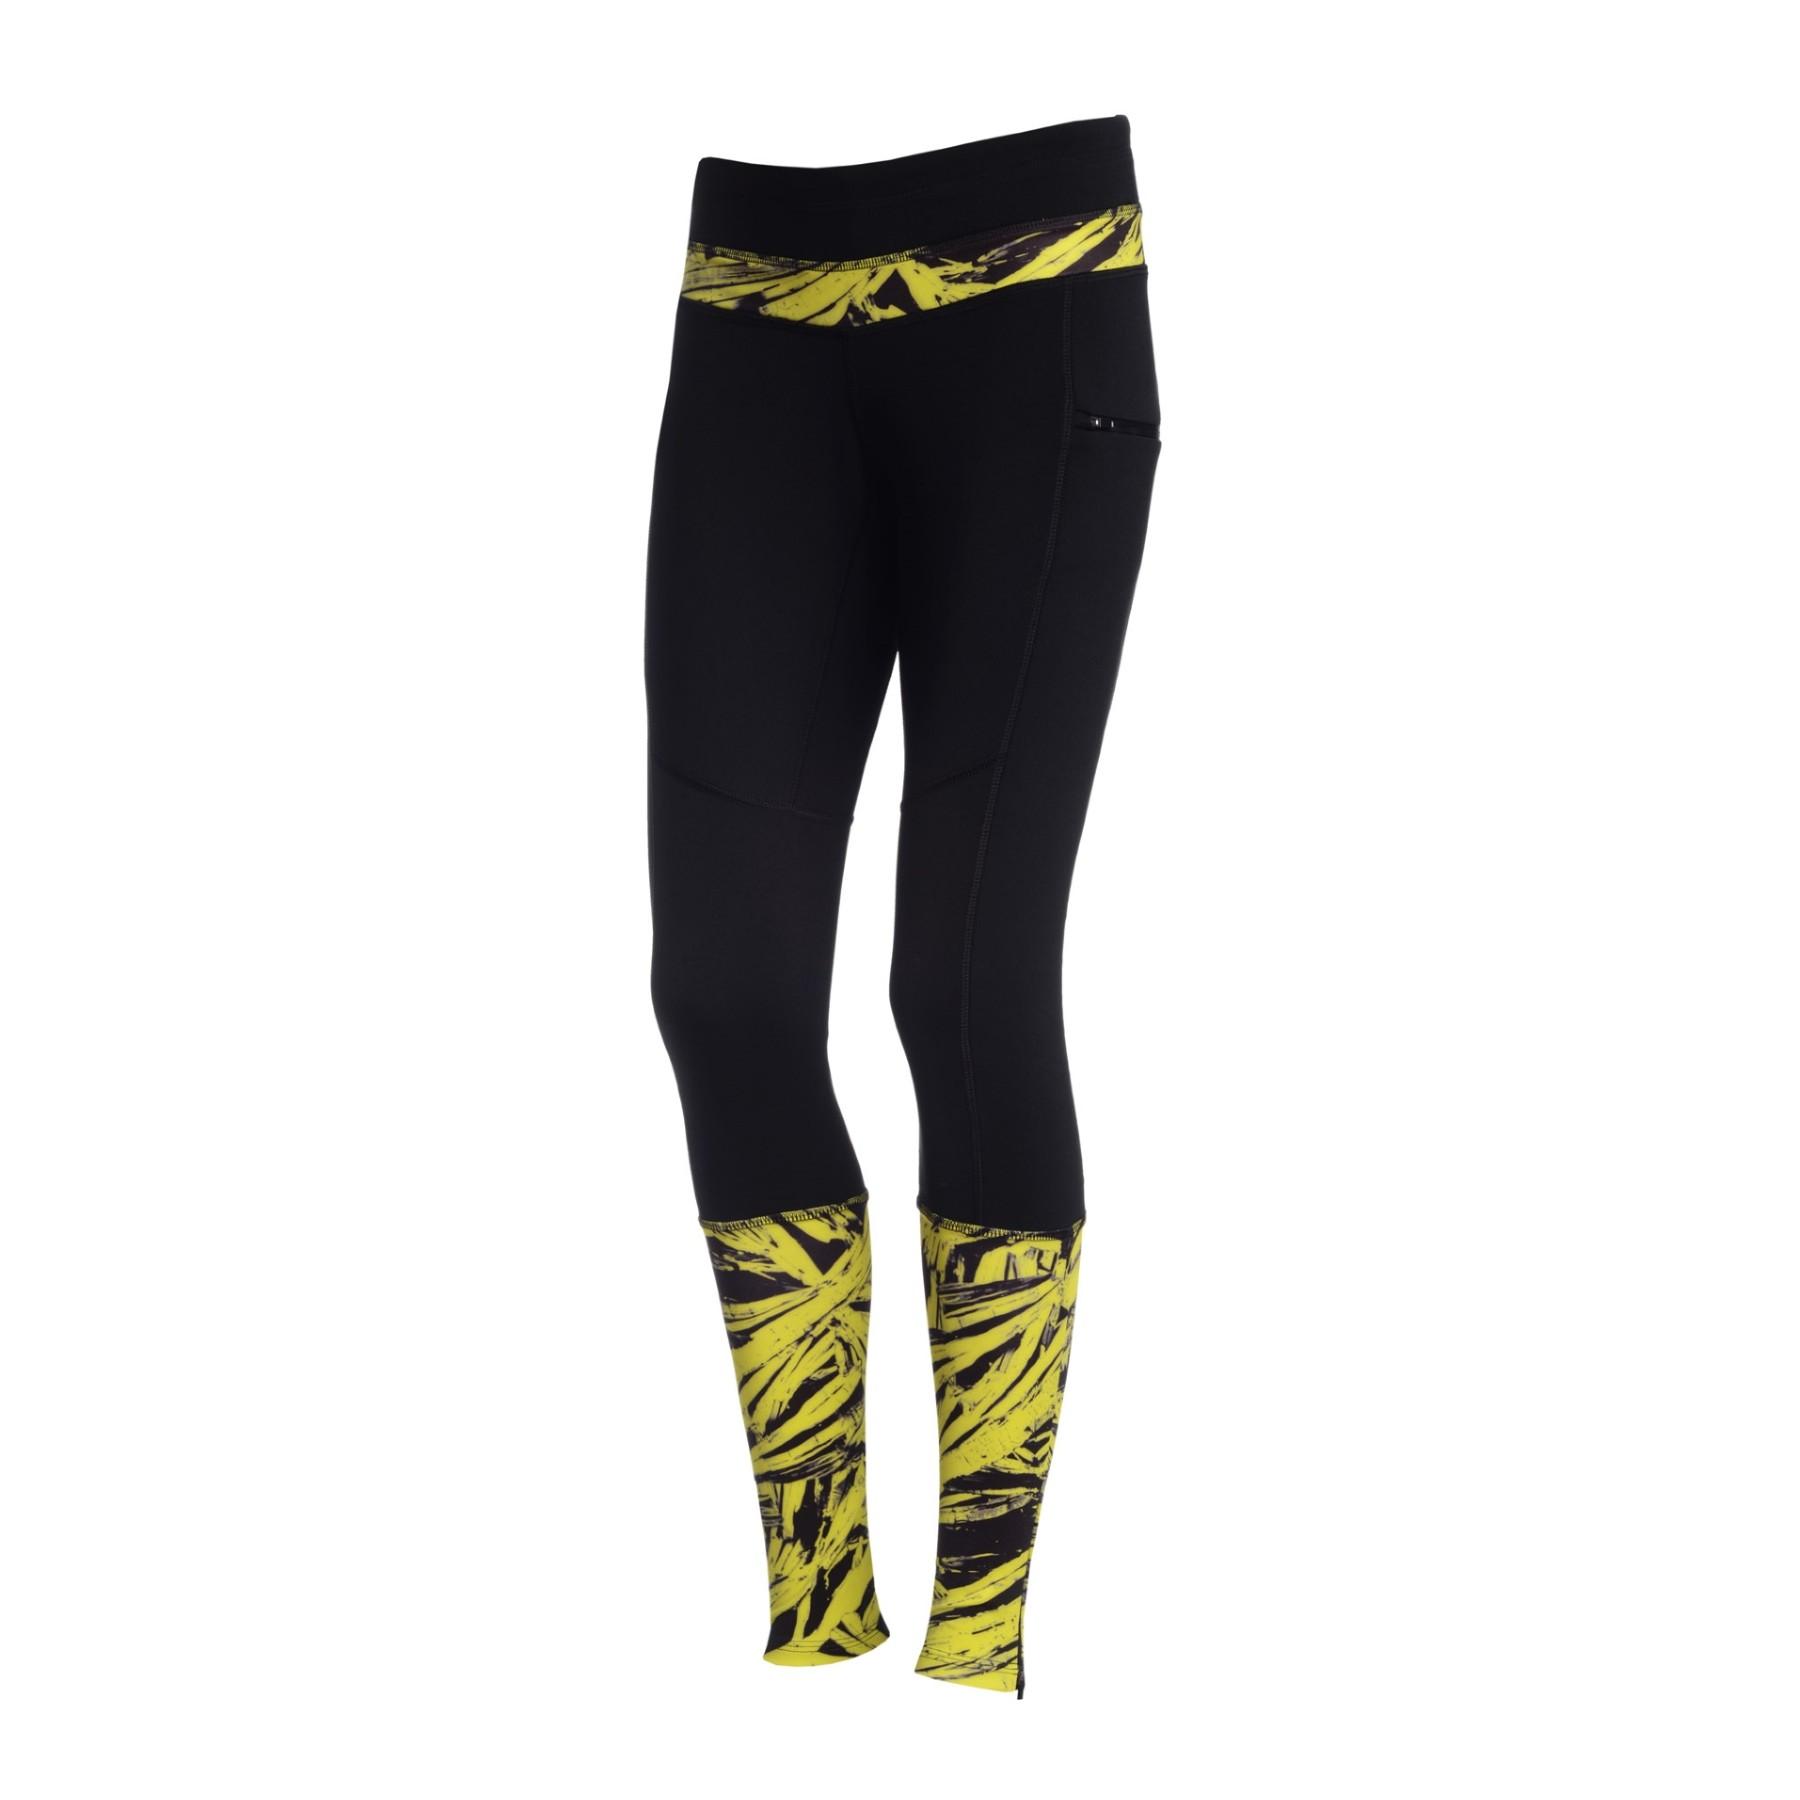 nessi damen warme leggings osod 32 laufhose fitnesshose. Black Bedroom Furniture Sets. Home Design Ideas